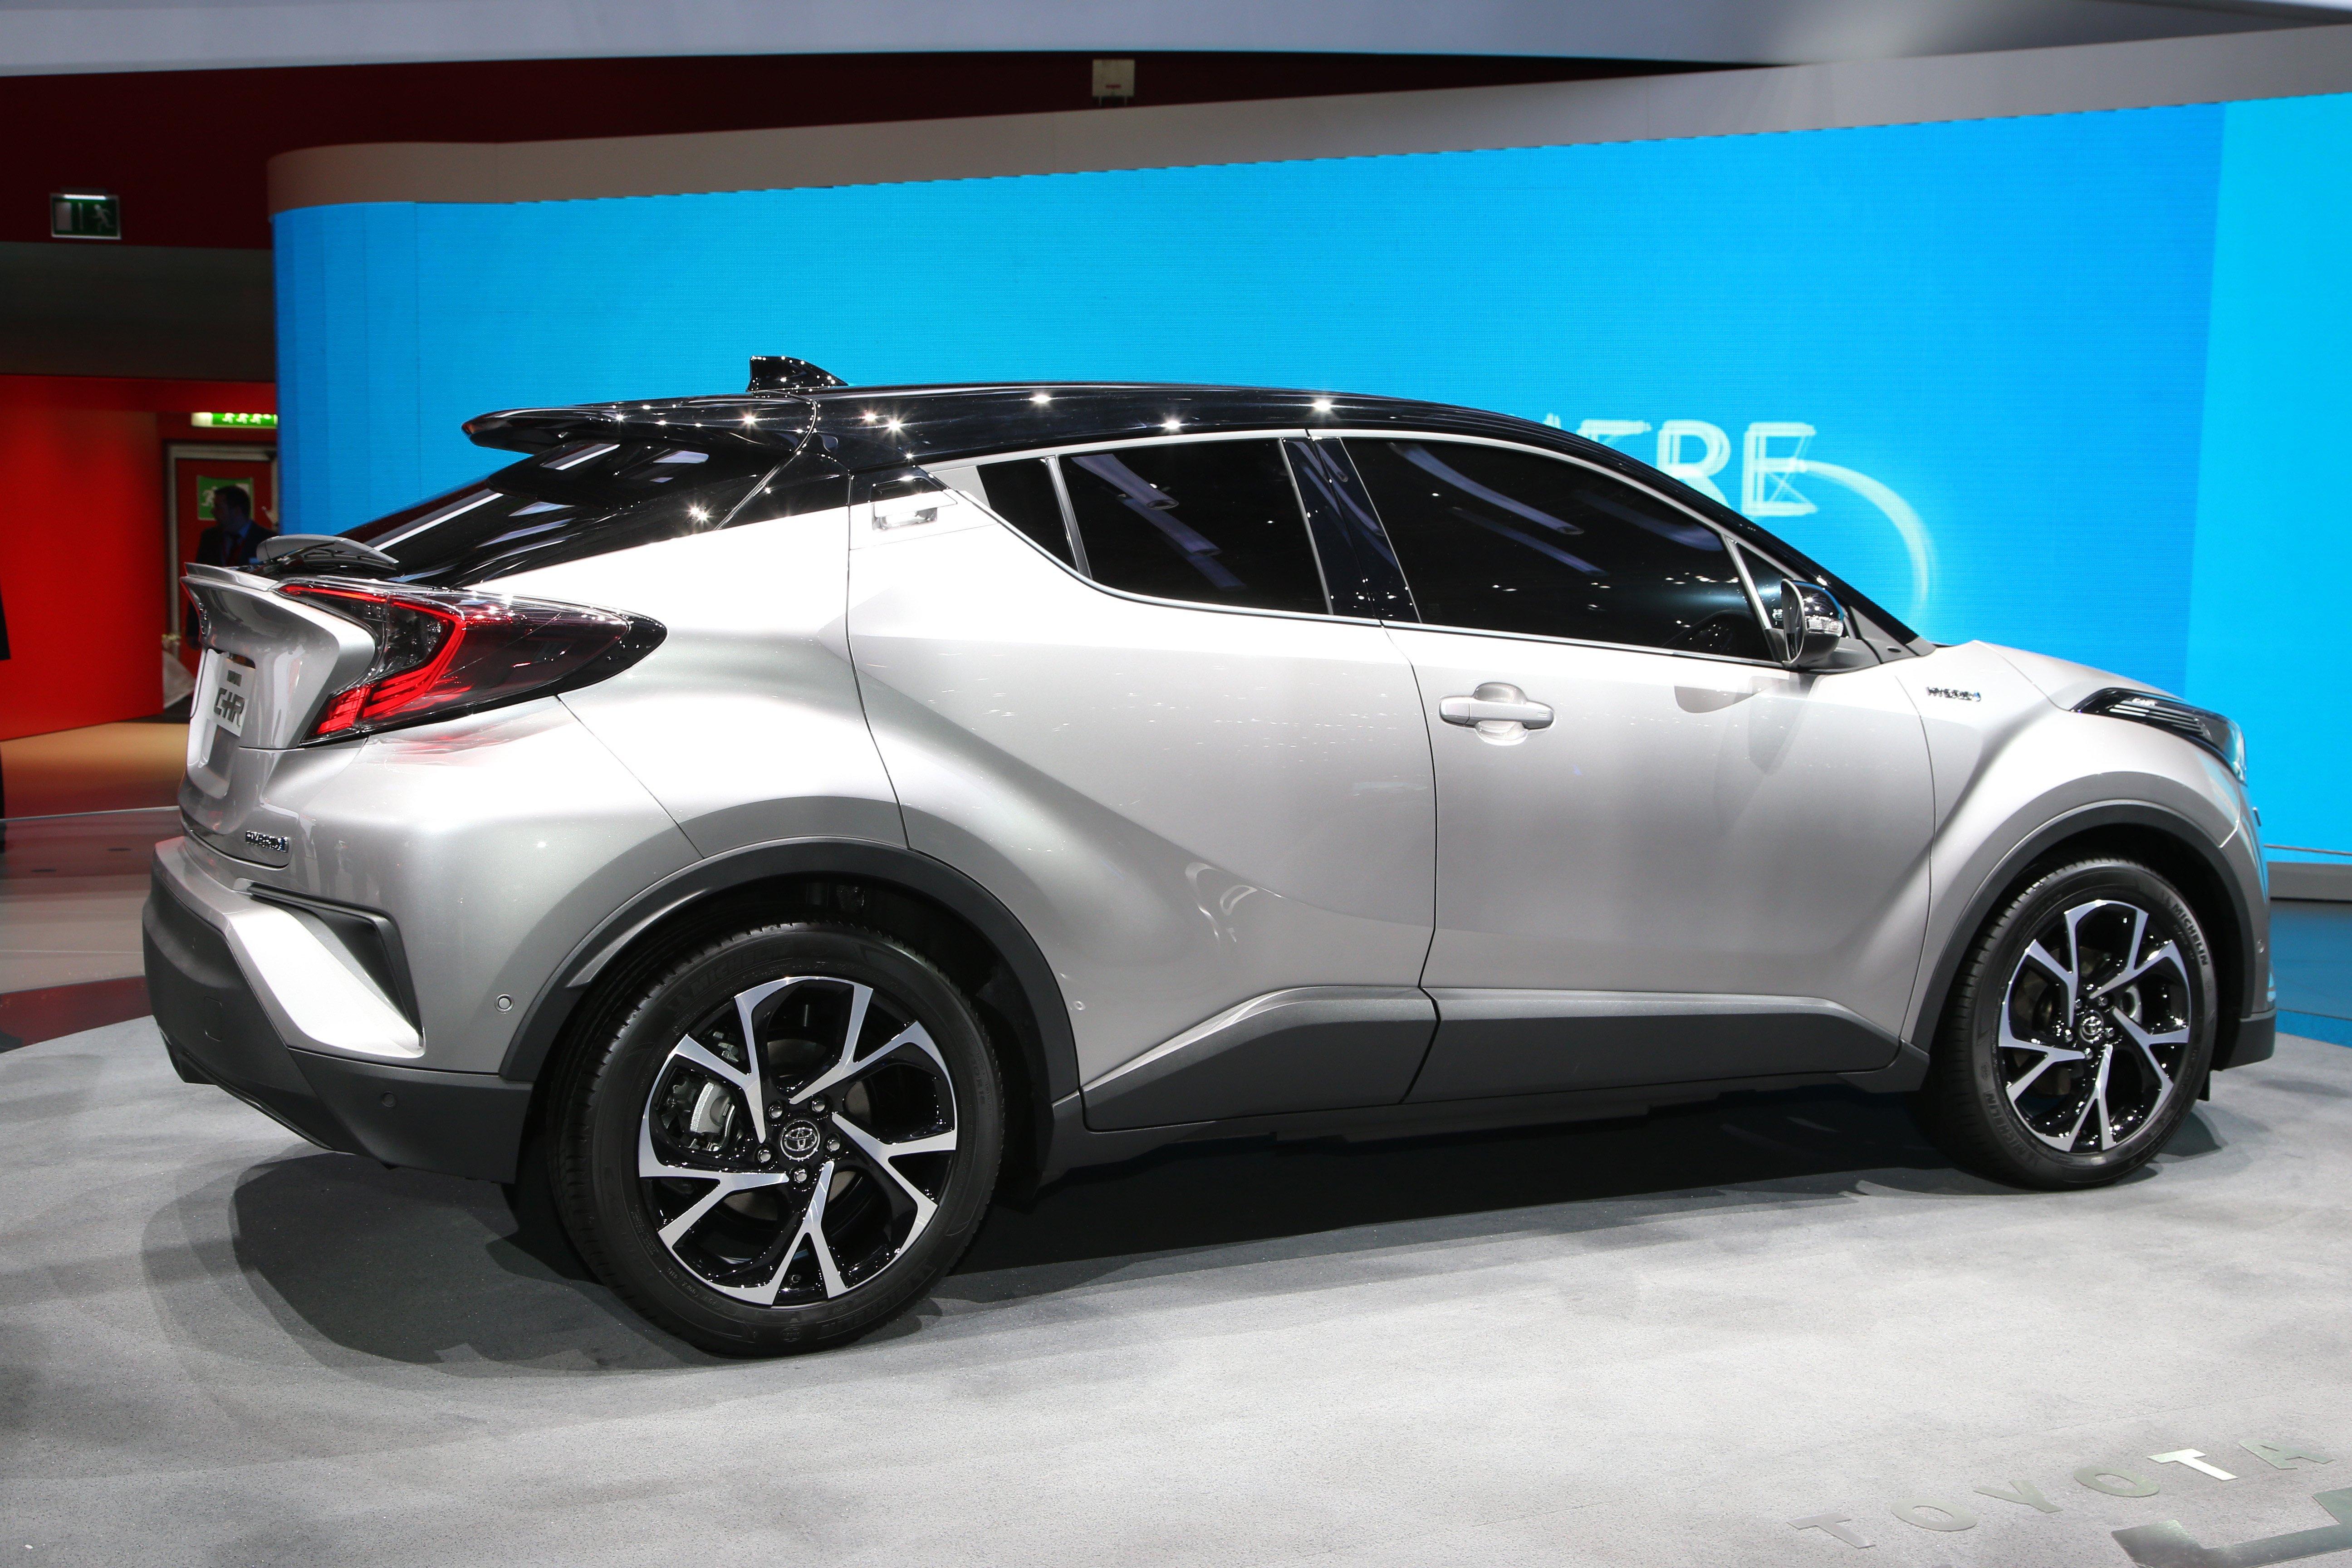 toyota chr 2017 - Cars Auto New - Cars Auto New